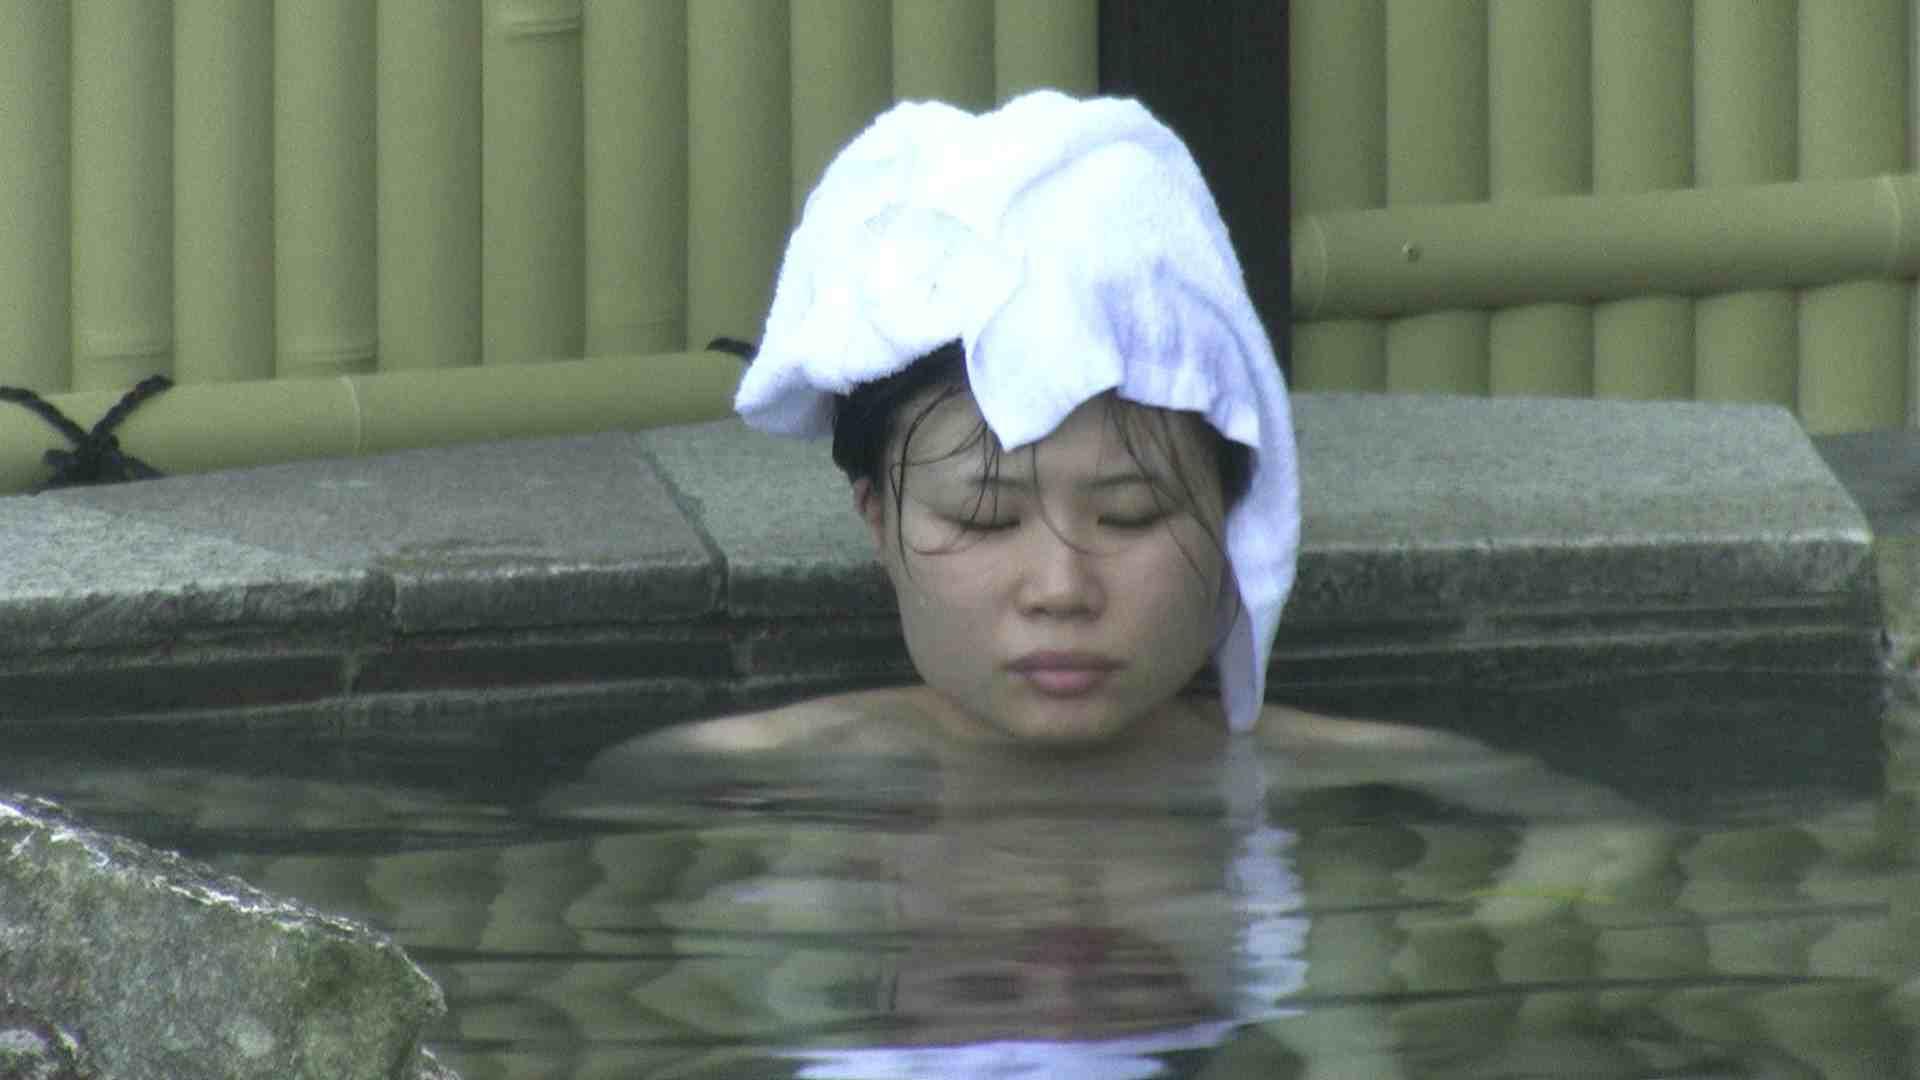 Aquaな露天風呂Vol.183 盗撮 | OLセックス  69画像 55